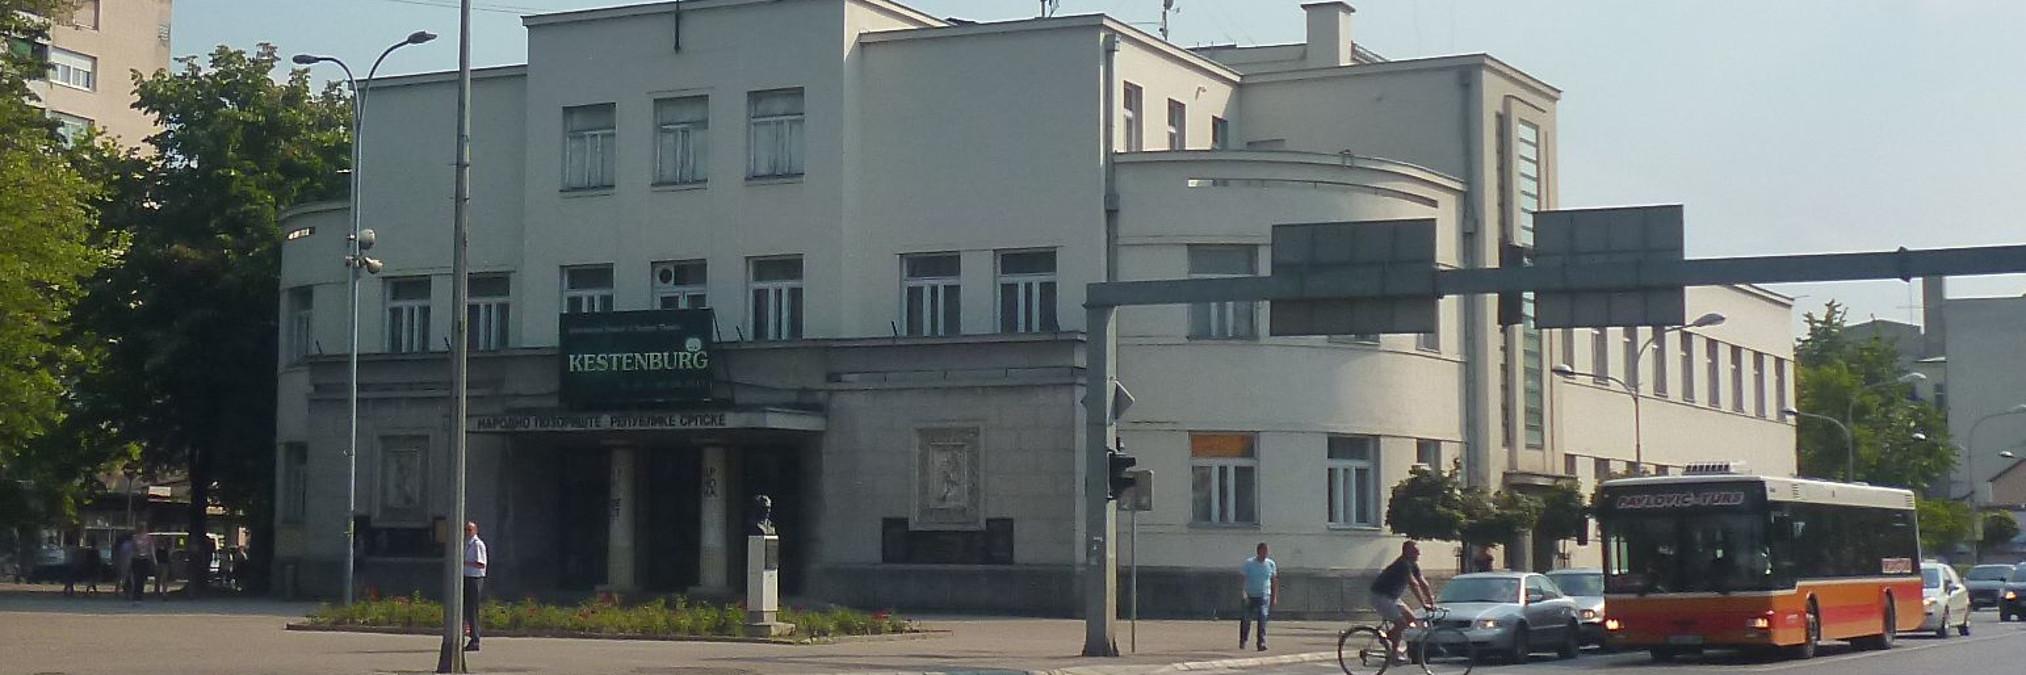 Народный театр Республики Сербской . Фото: Елена Арсениевич, CC BY-SA 3.0